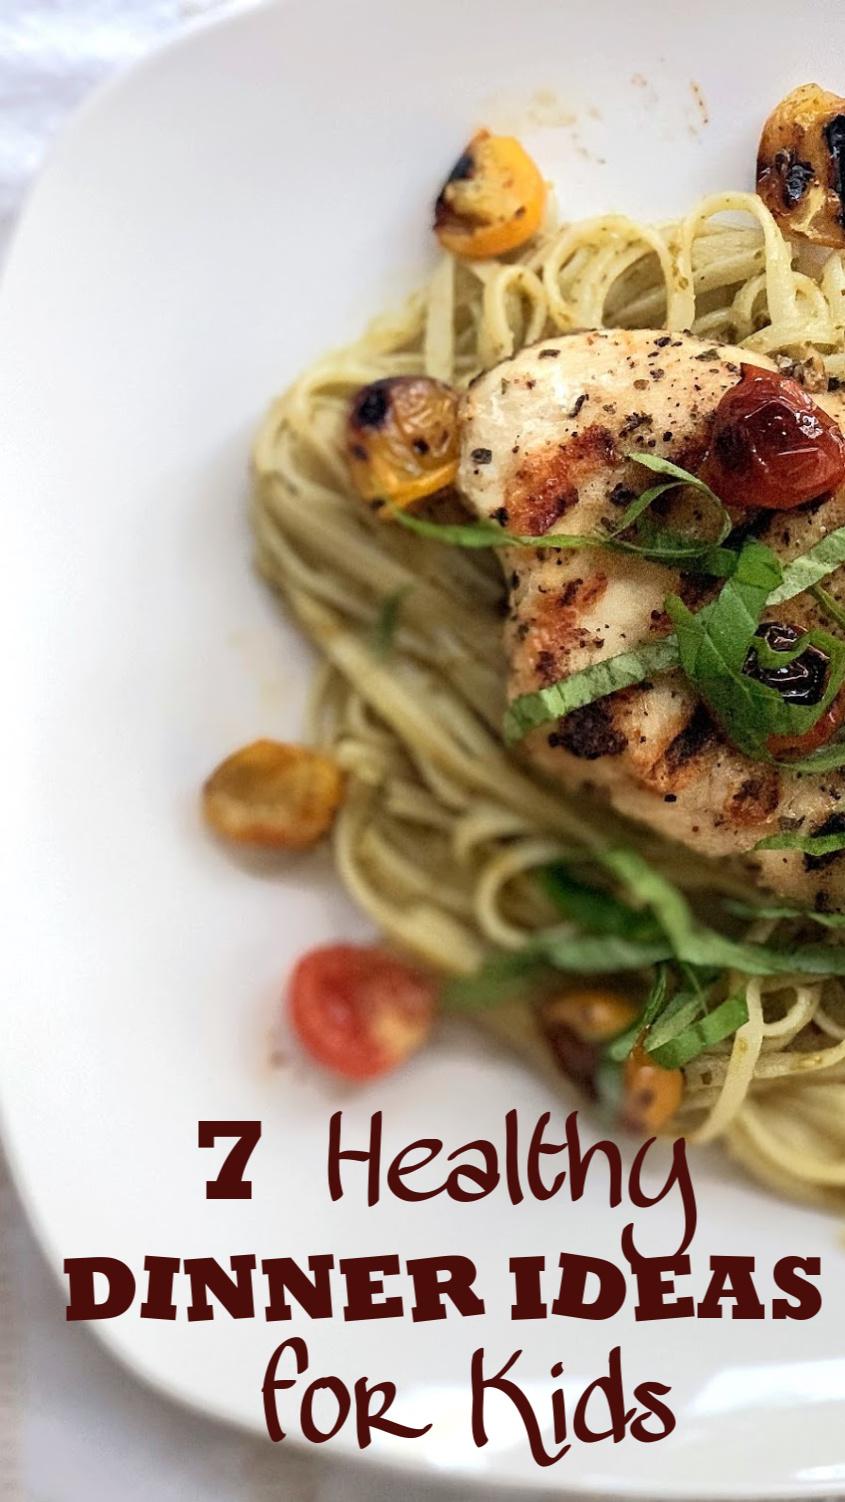 7 Healthy Dinner Ideas for Kids